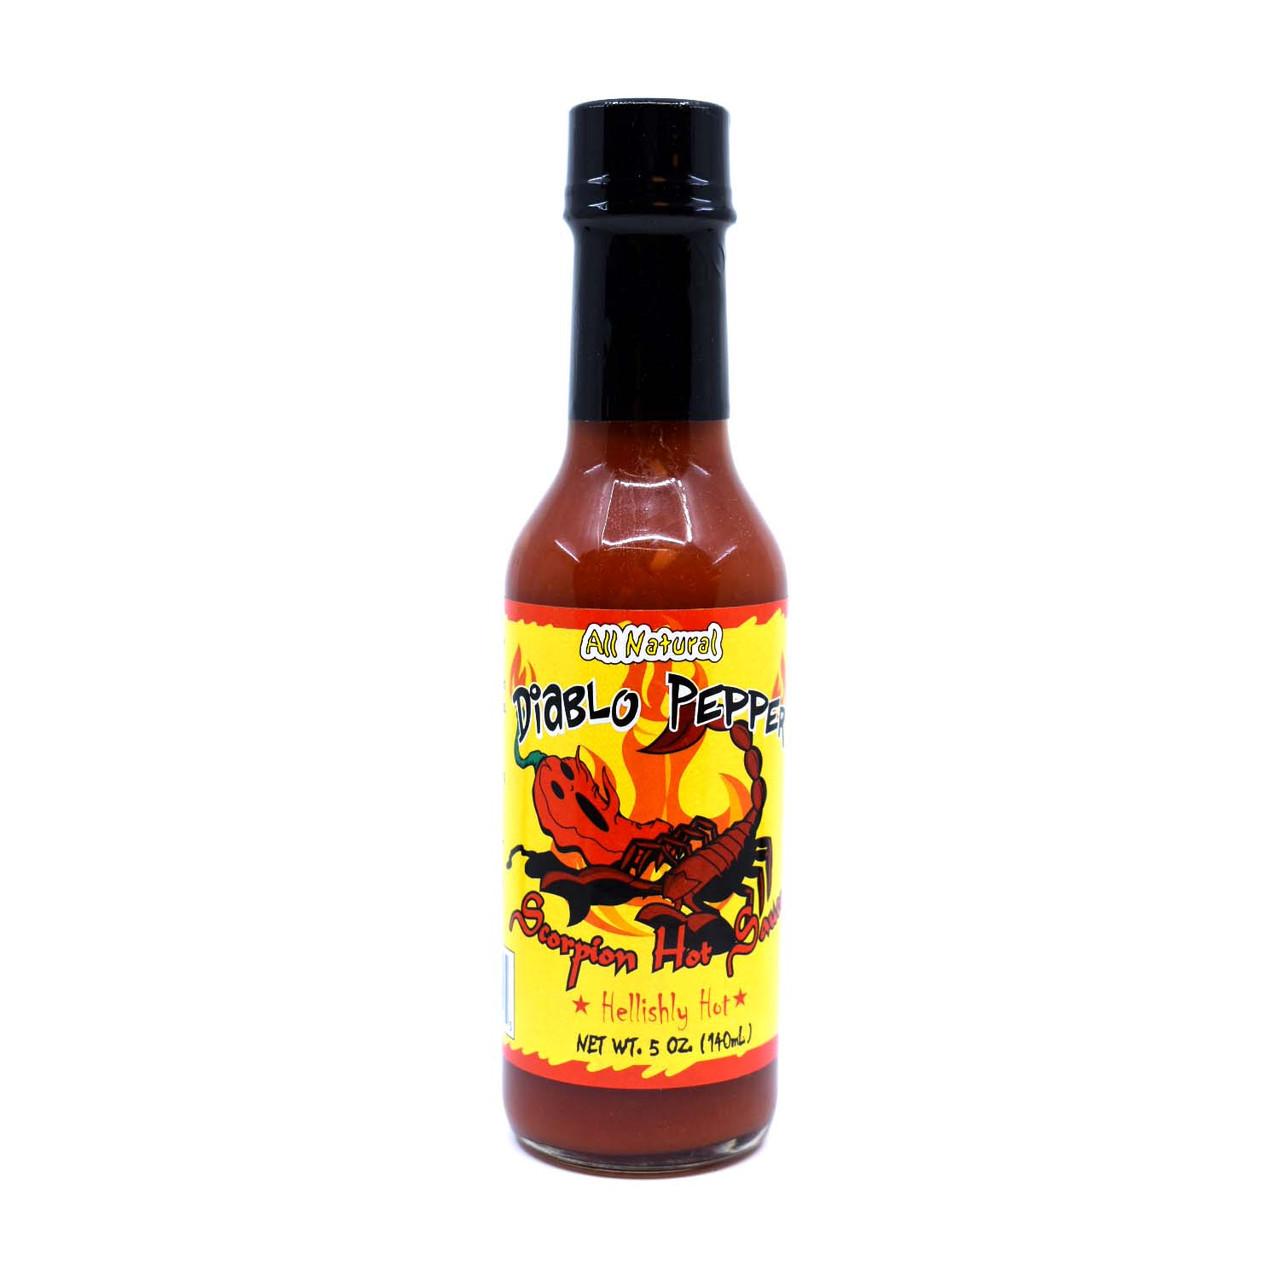 Diablo Pepper TRINIDAD SCORPION Hot Sauce 5oz